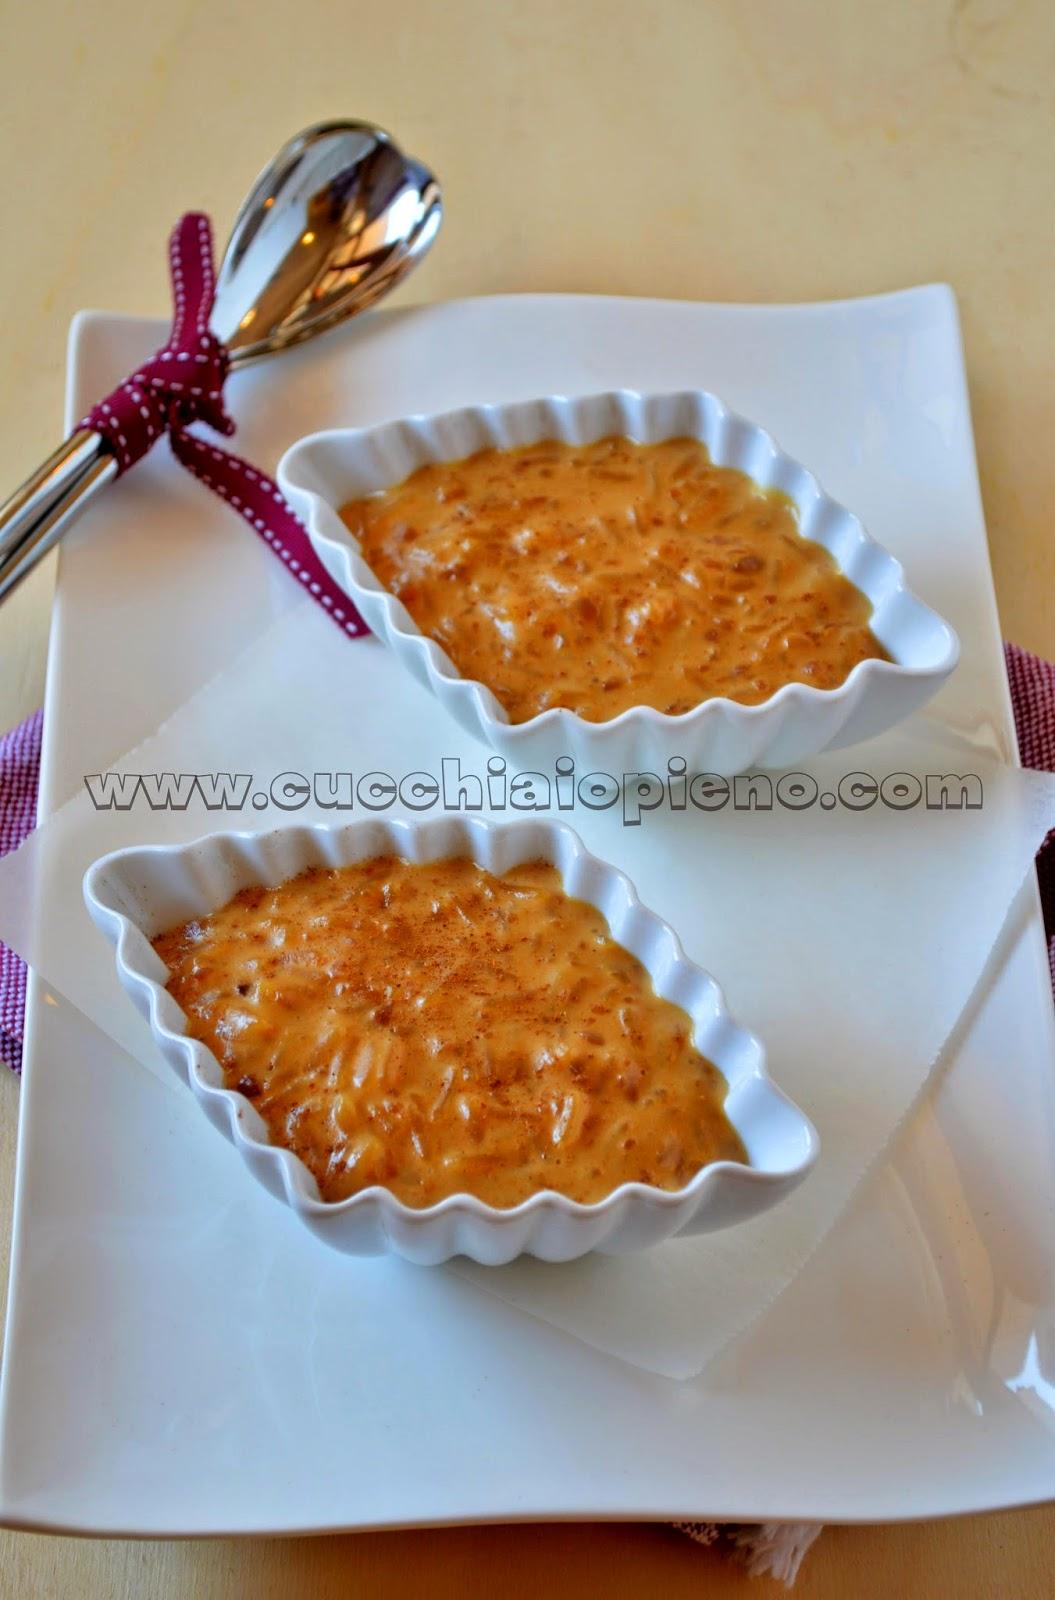 arroz doce cremoso